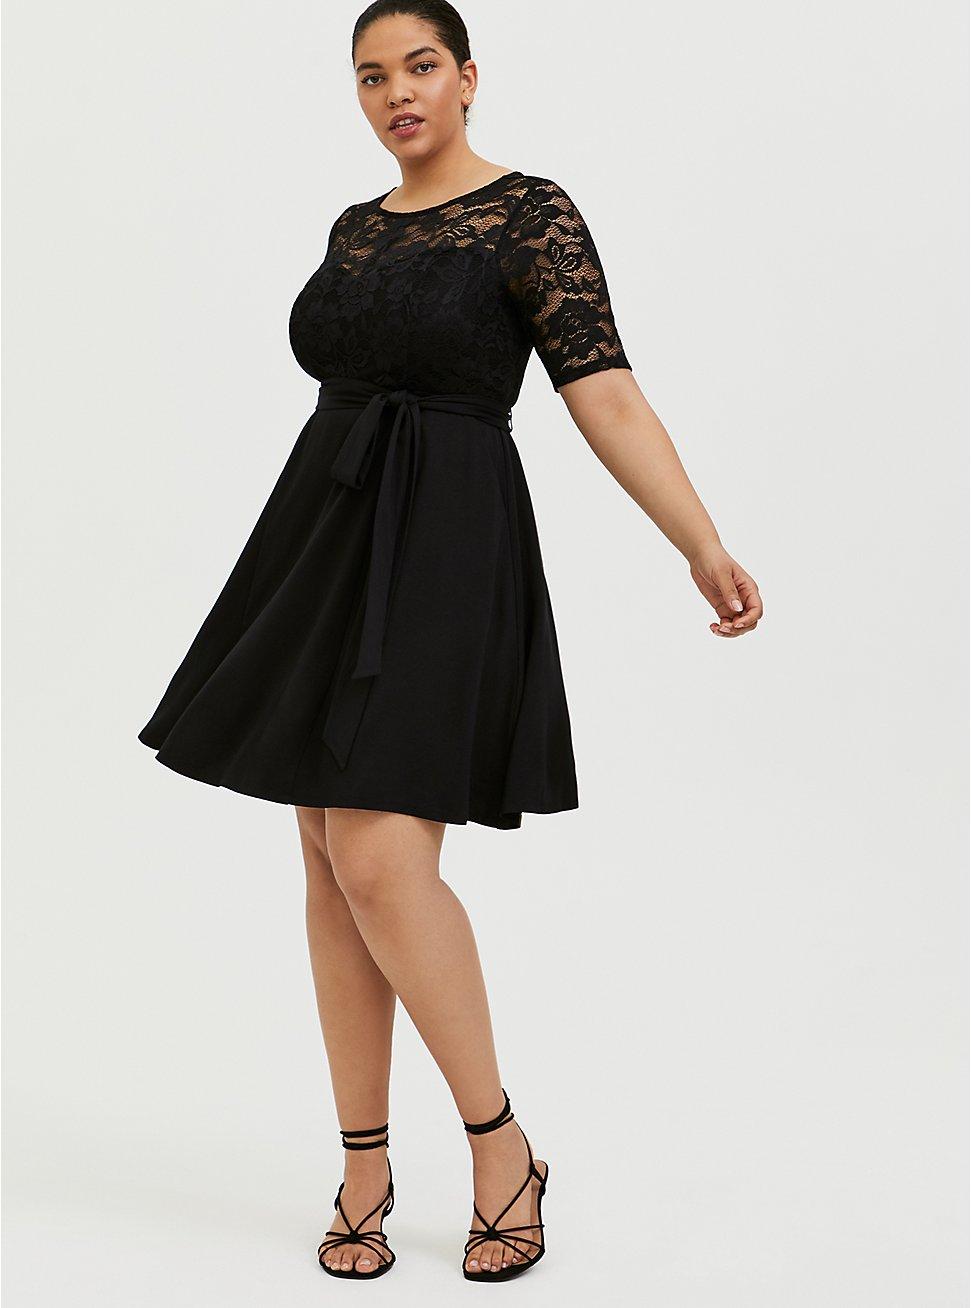 Plus Size Black Ponte & Lace Overlay Self Tie Skater Dress, DEEP BLACK, hi-res